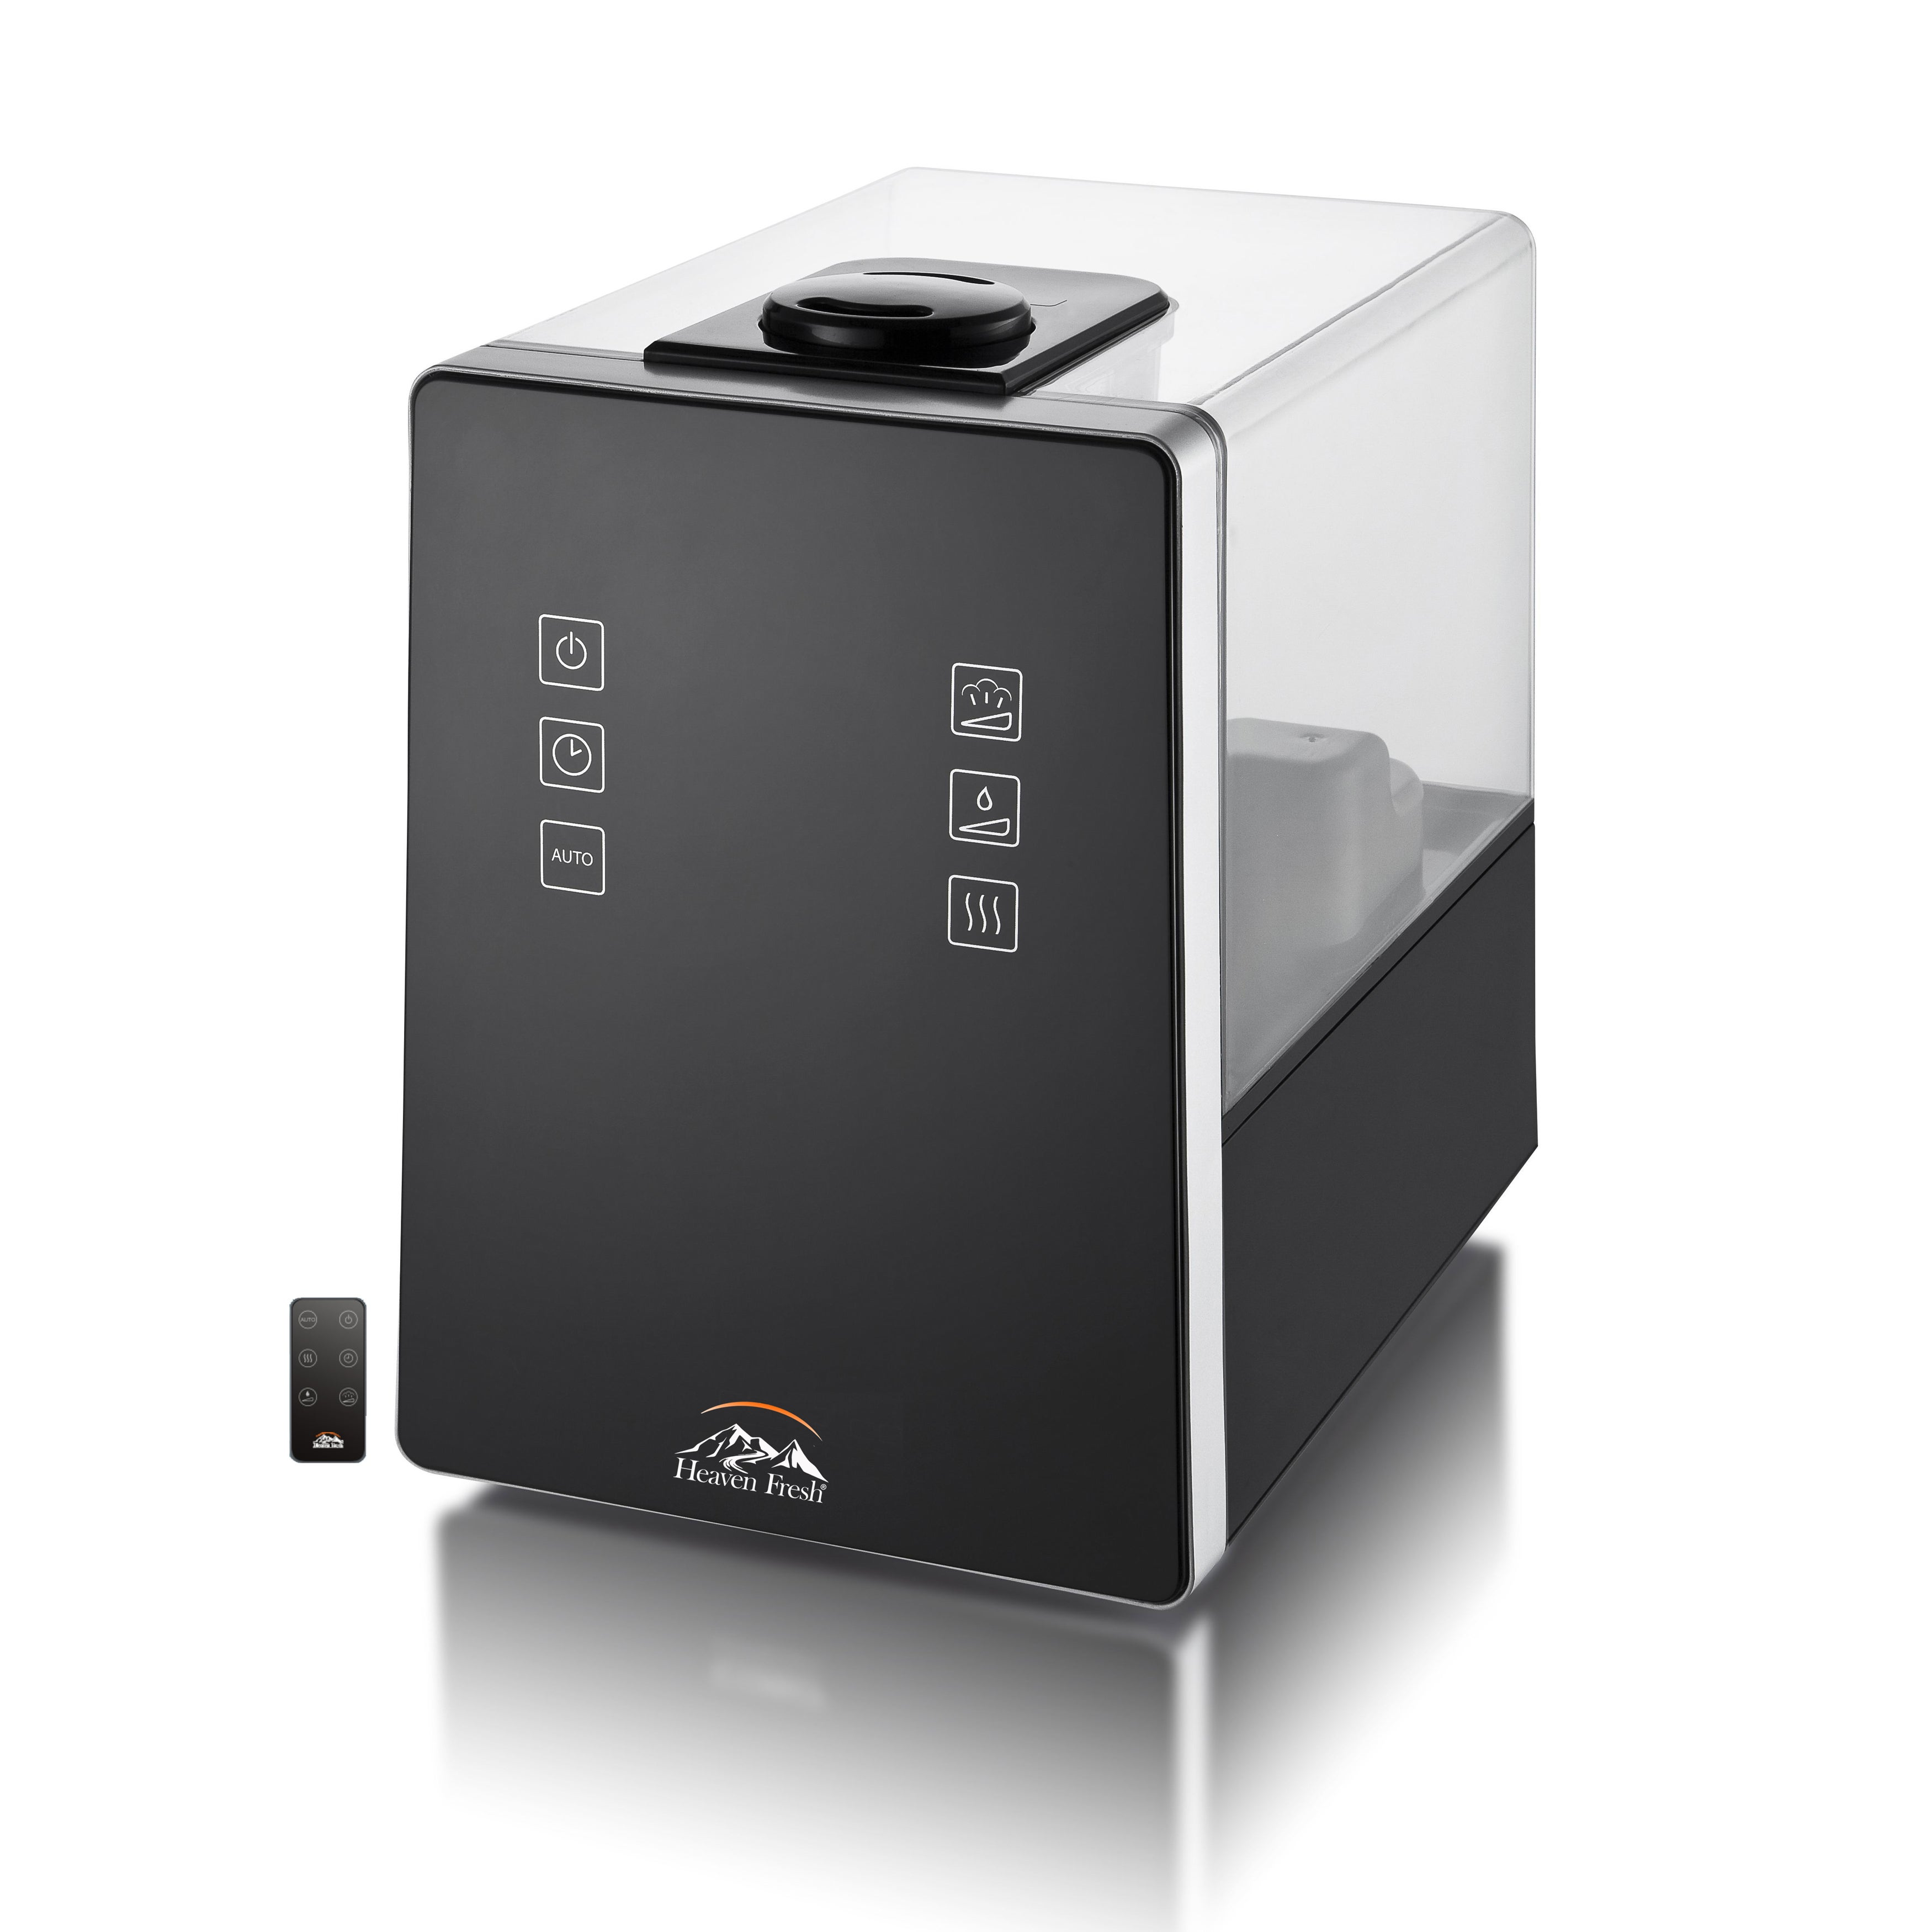 Heaven Fresh HF 710-Black Digital Ultrasonic Cool & Warm Mist